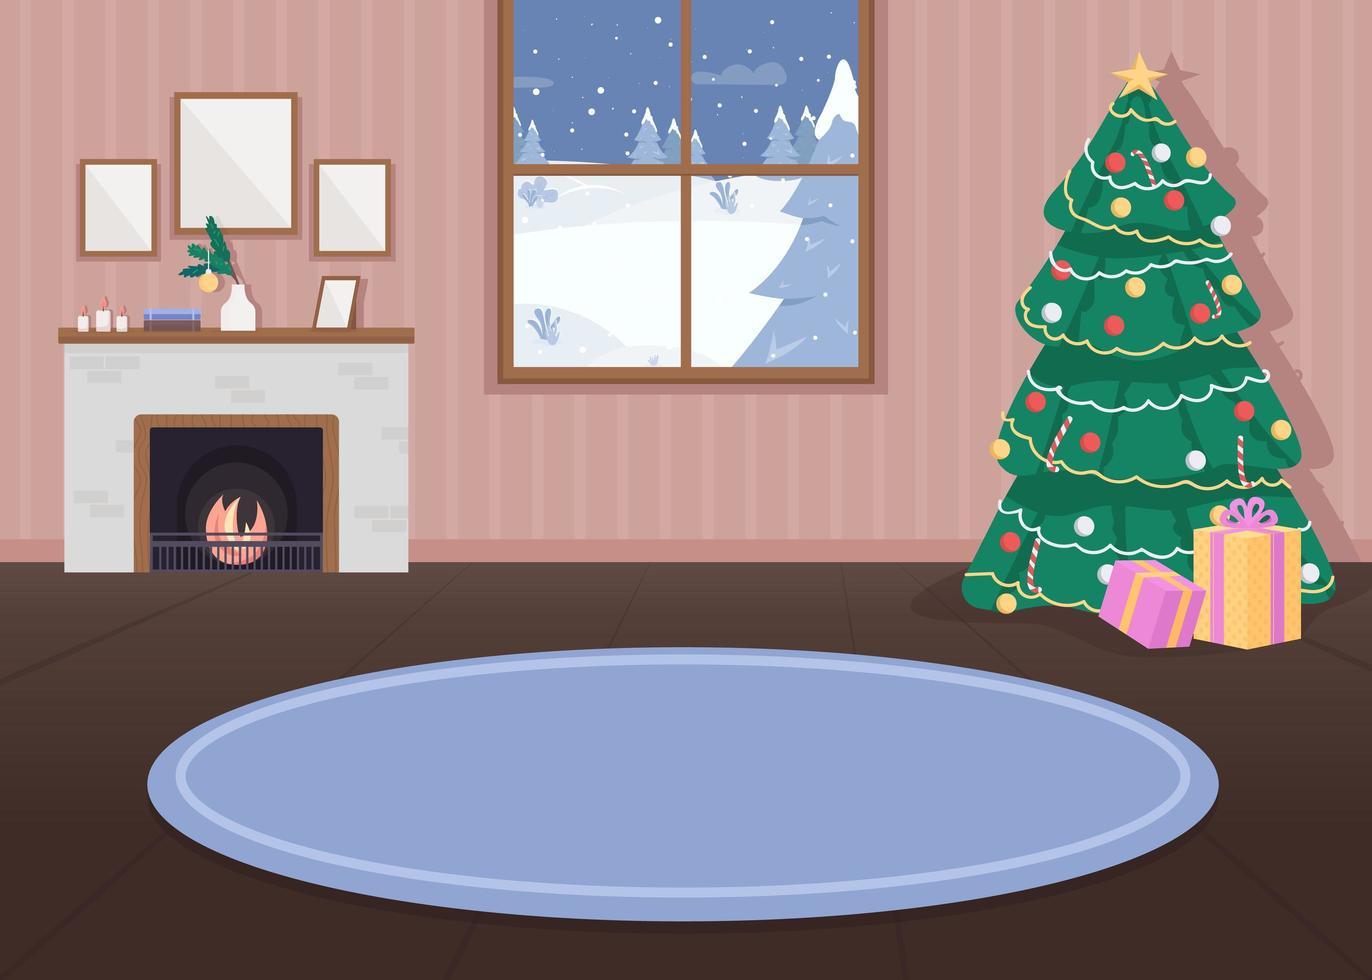 casa decorada de natal vetor